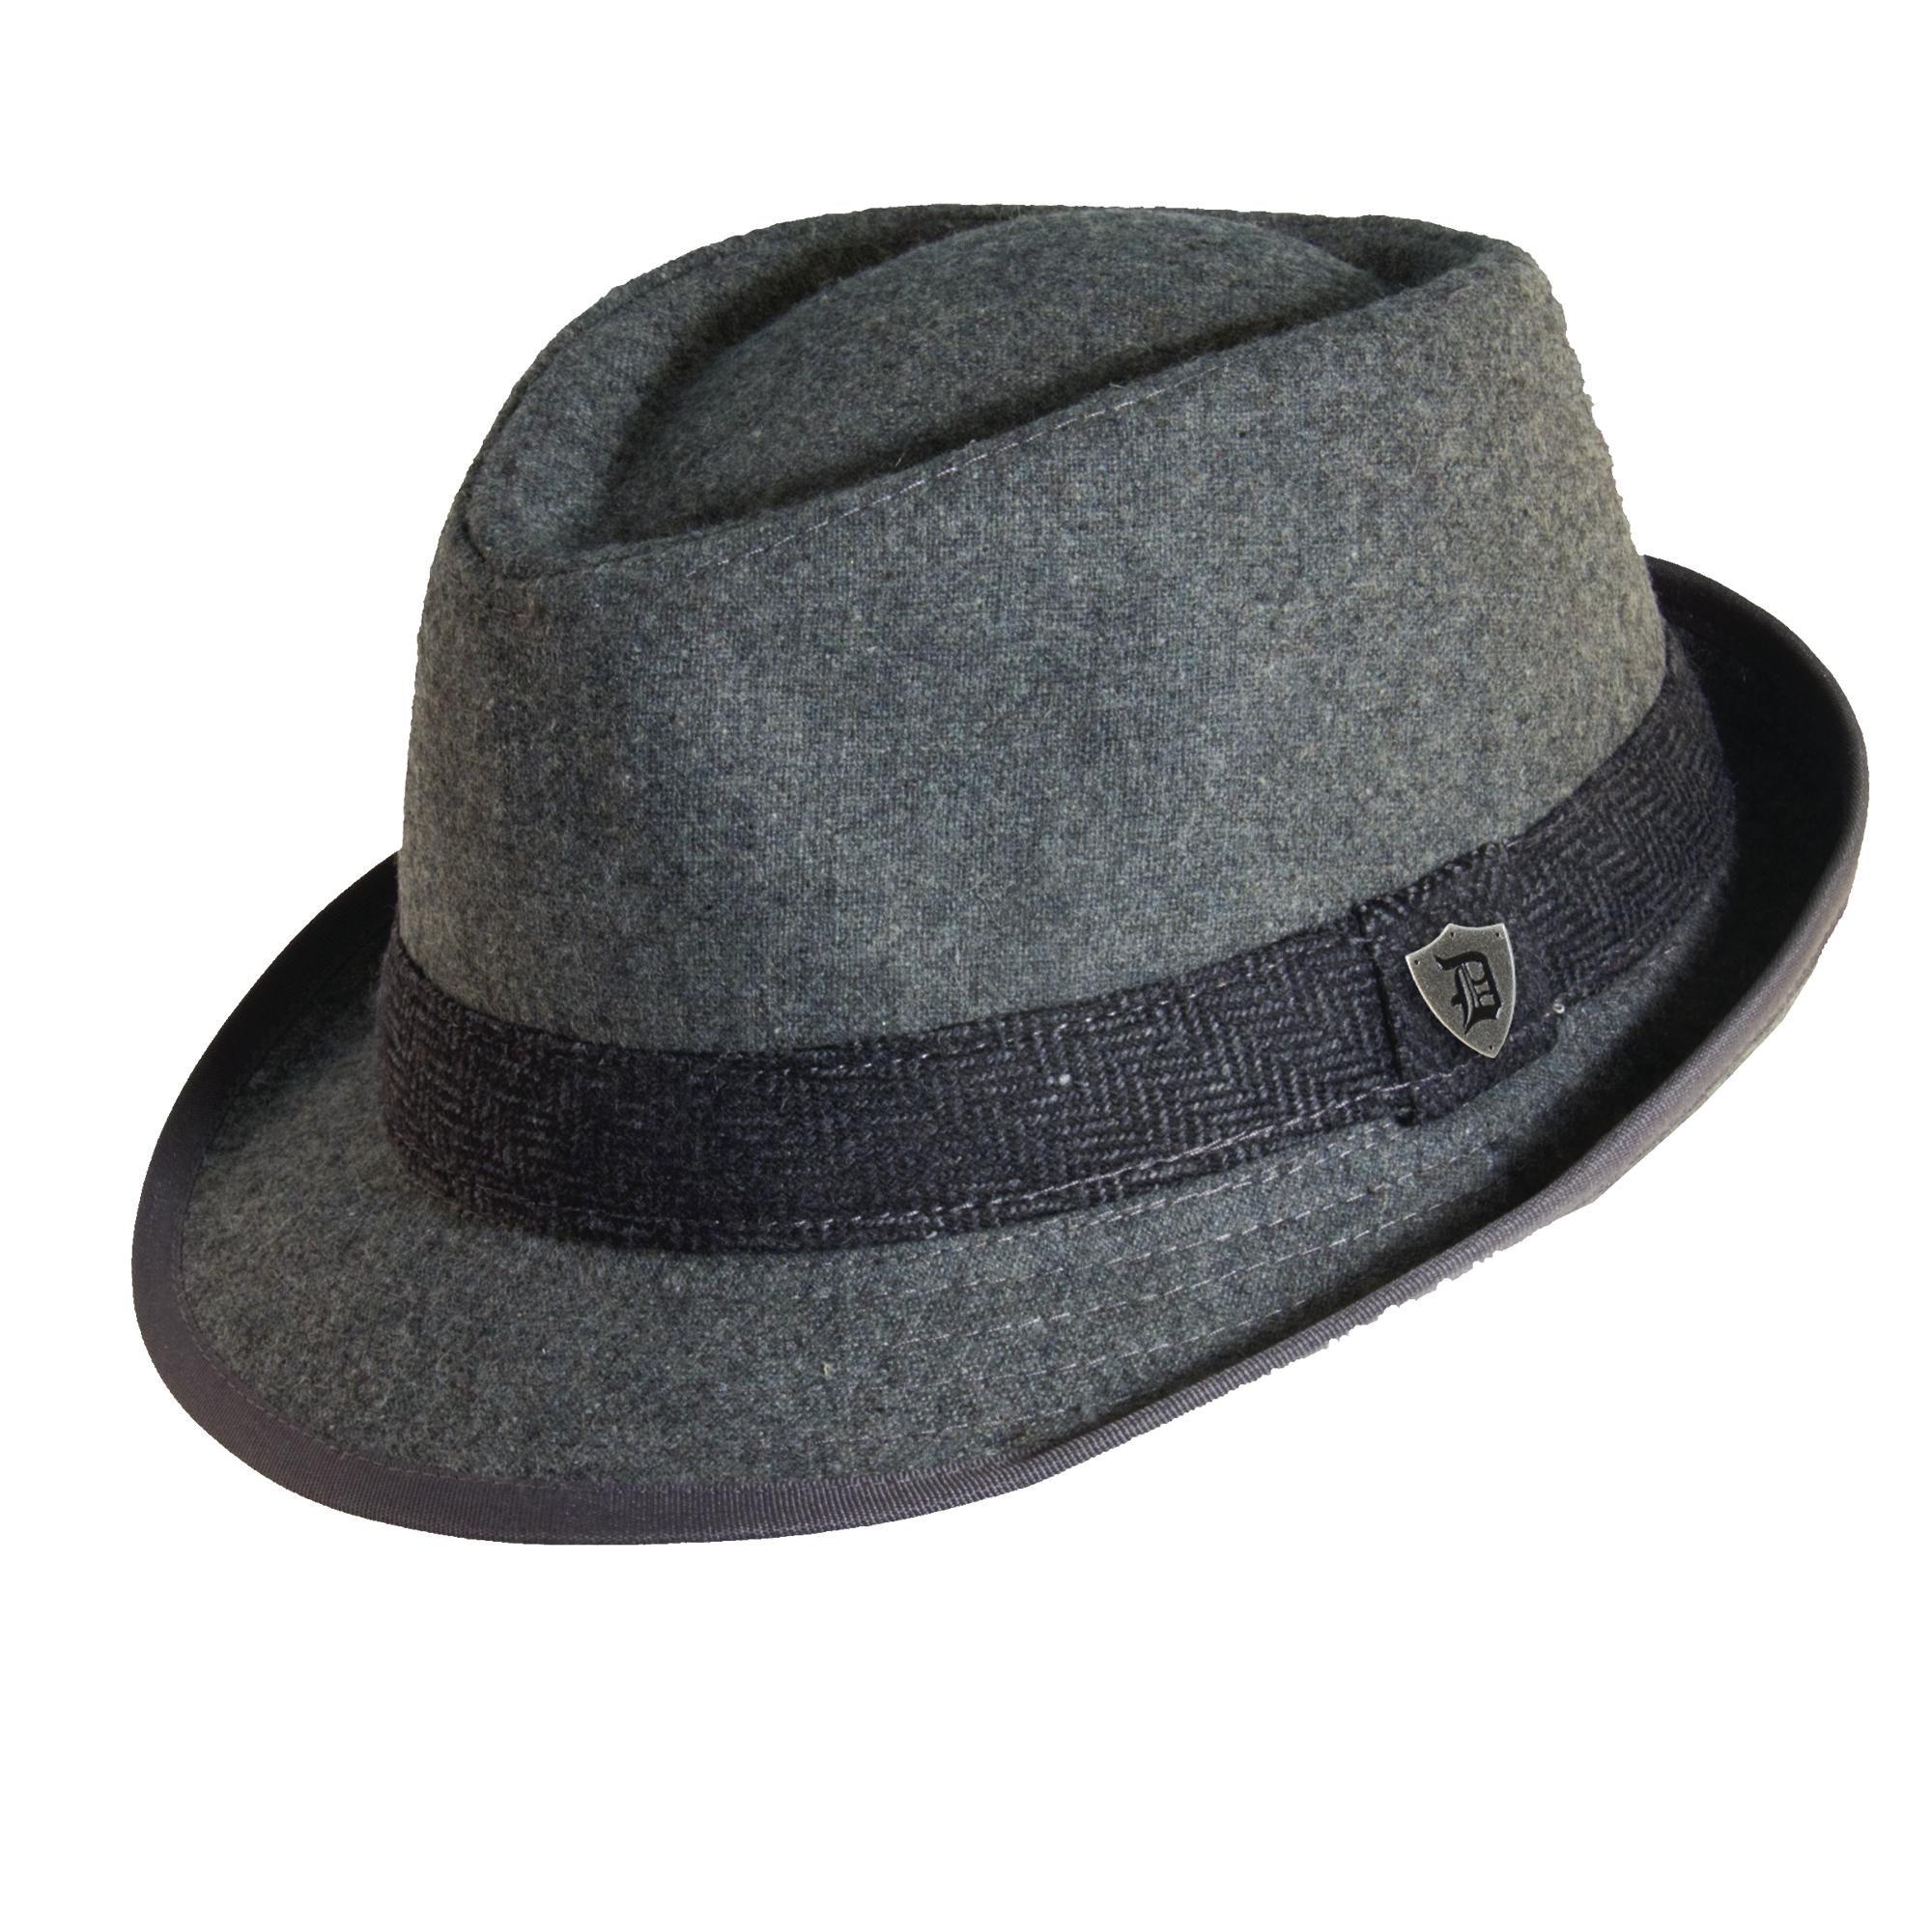 Dorfman Pacific Mens Wool Herringbone Band Classic Fedora Hat (Grey, Large)